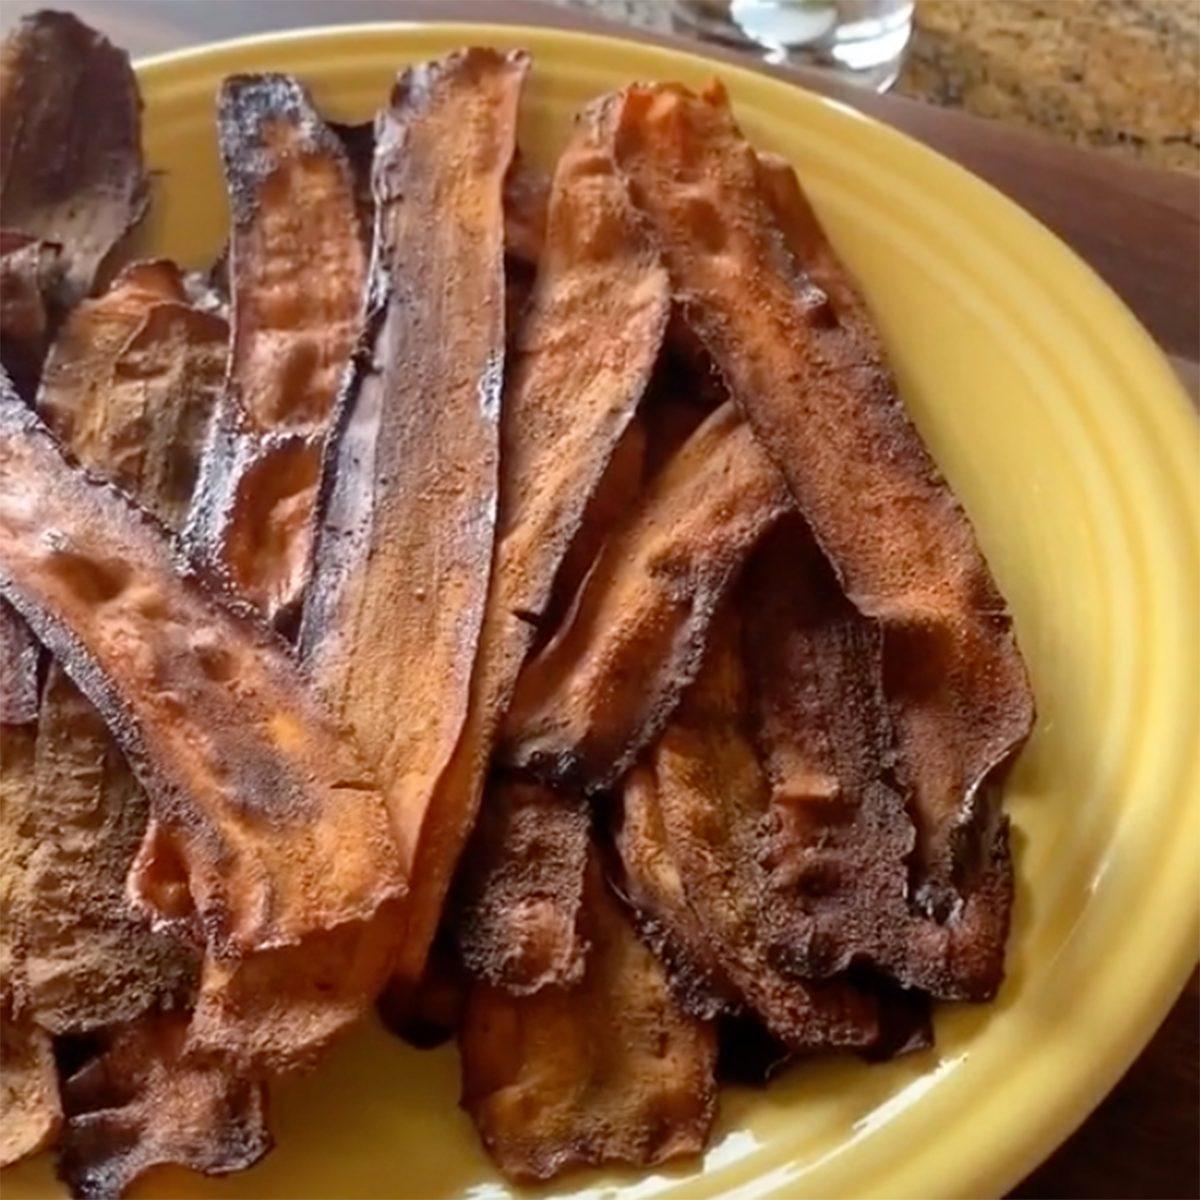 TIk tok vegan carrot bacon